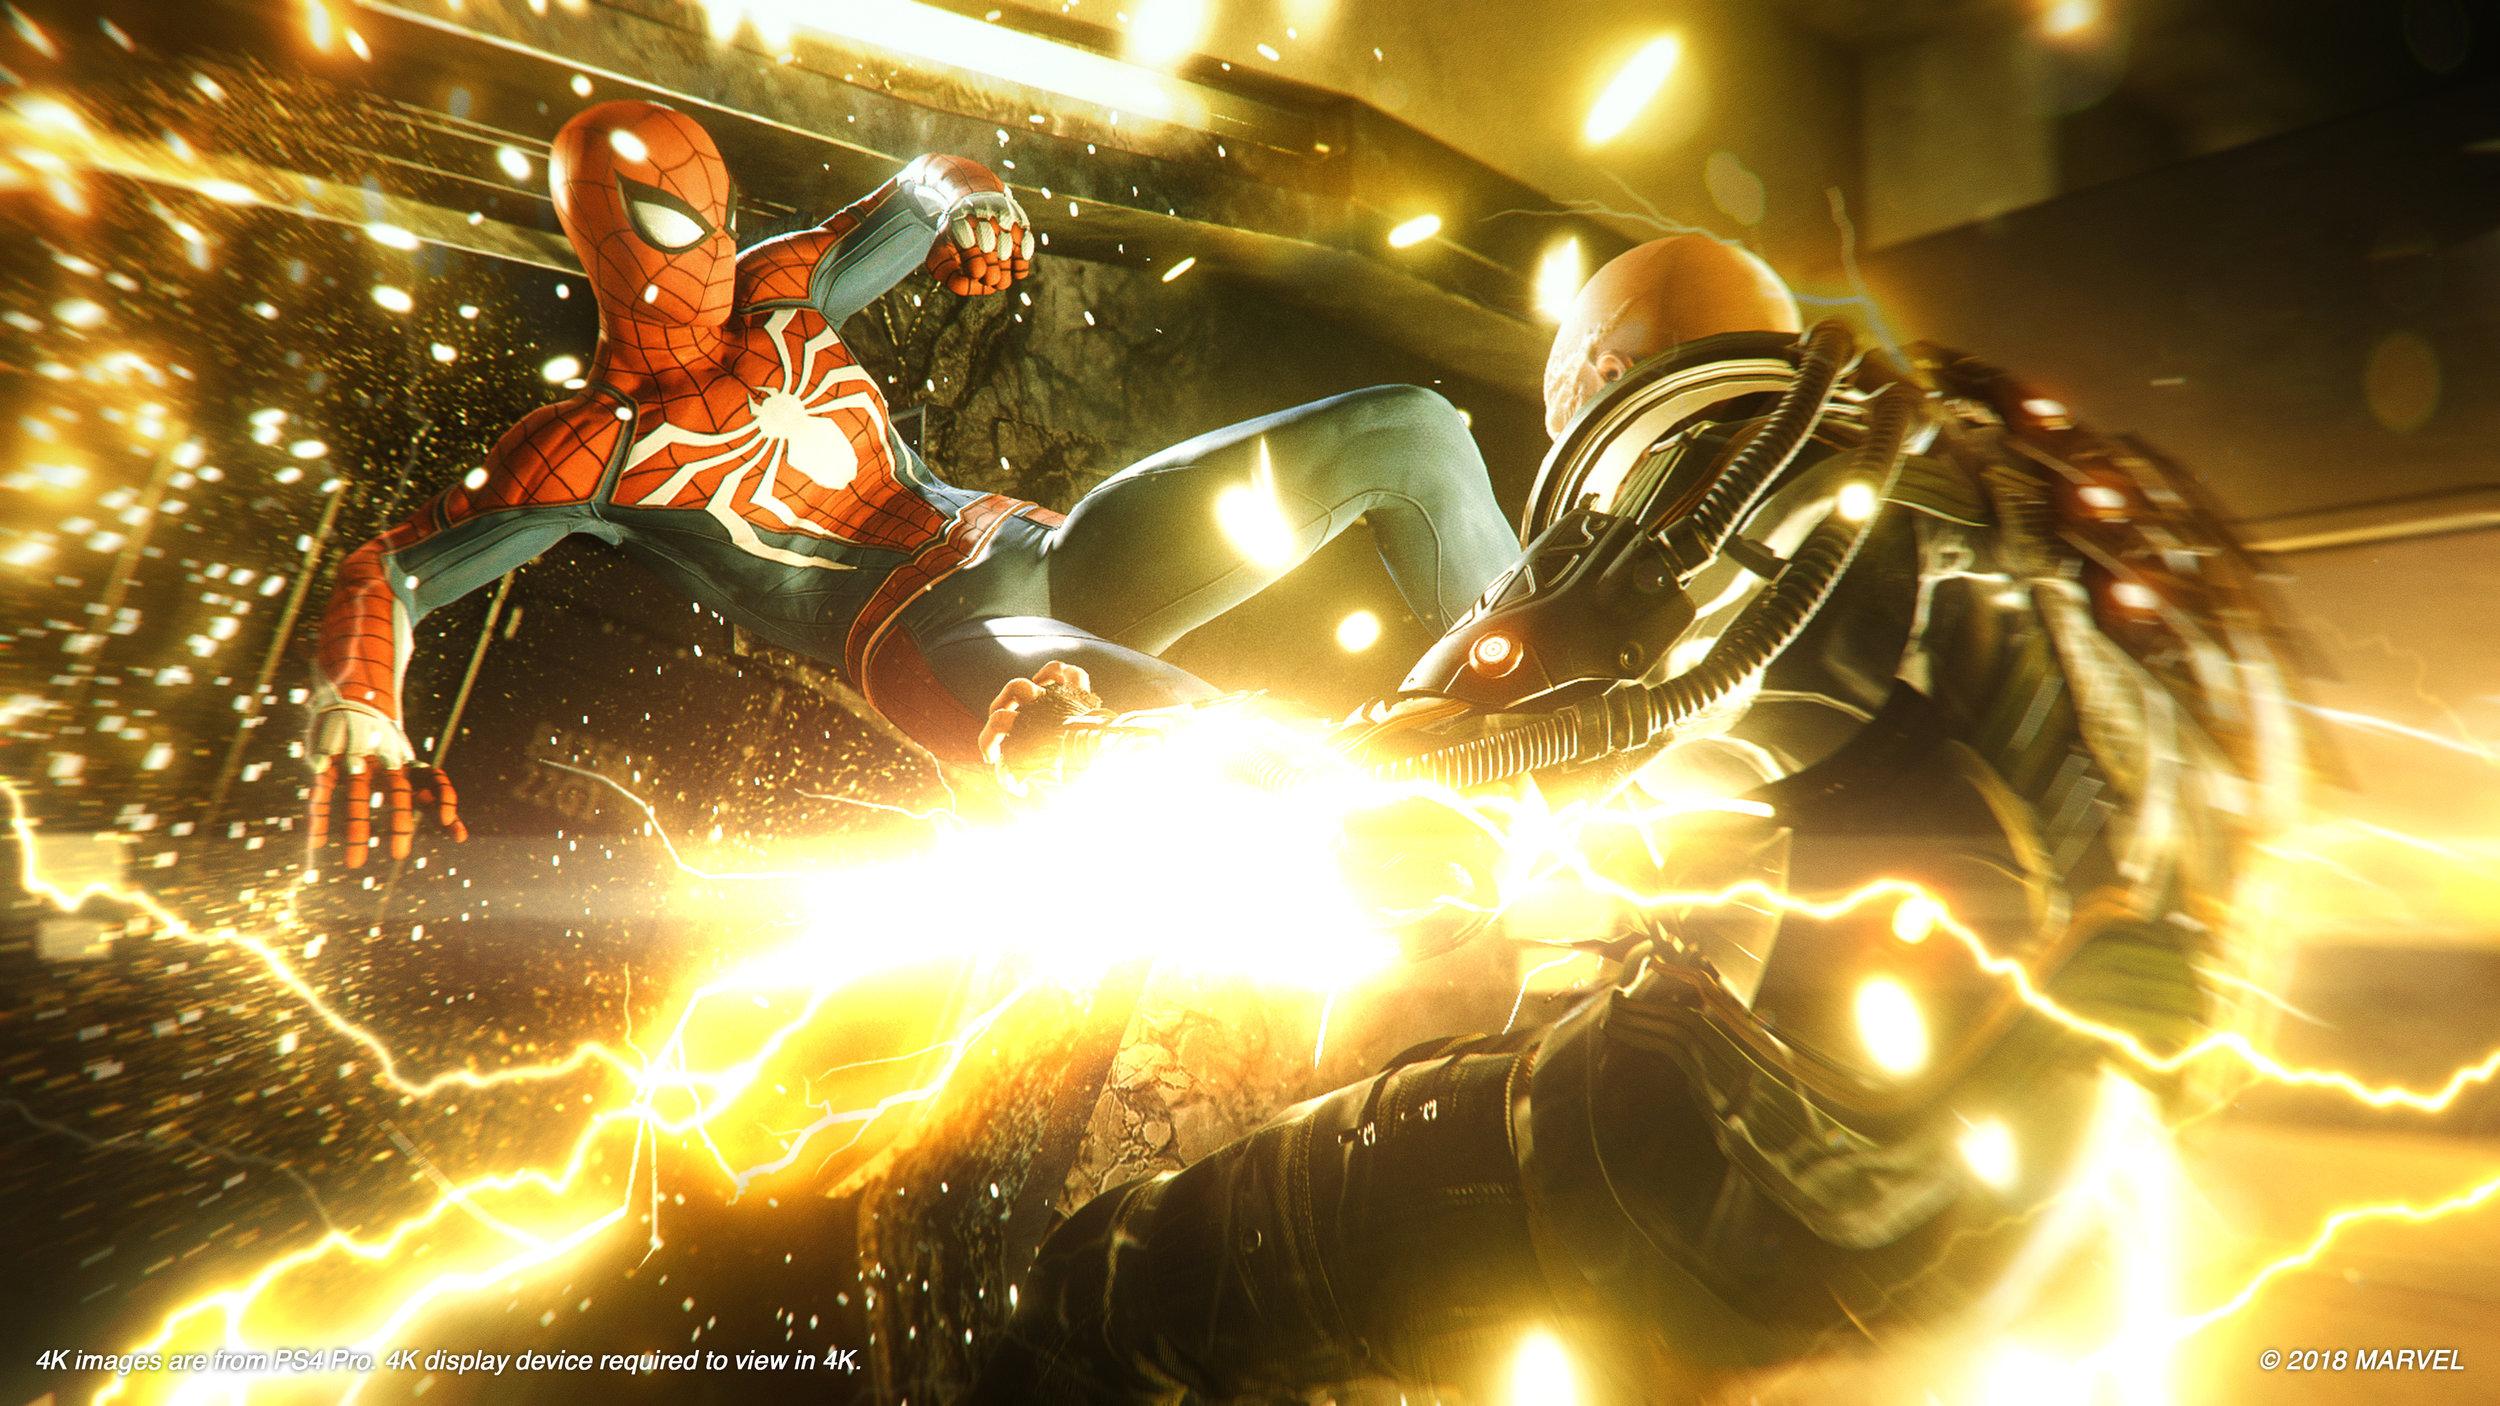 Spider-ManPS4_E32018_Electro_Legal.jpg